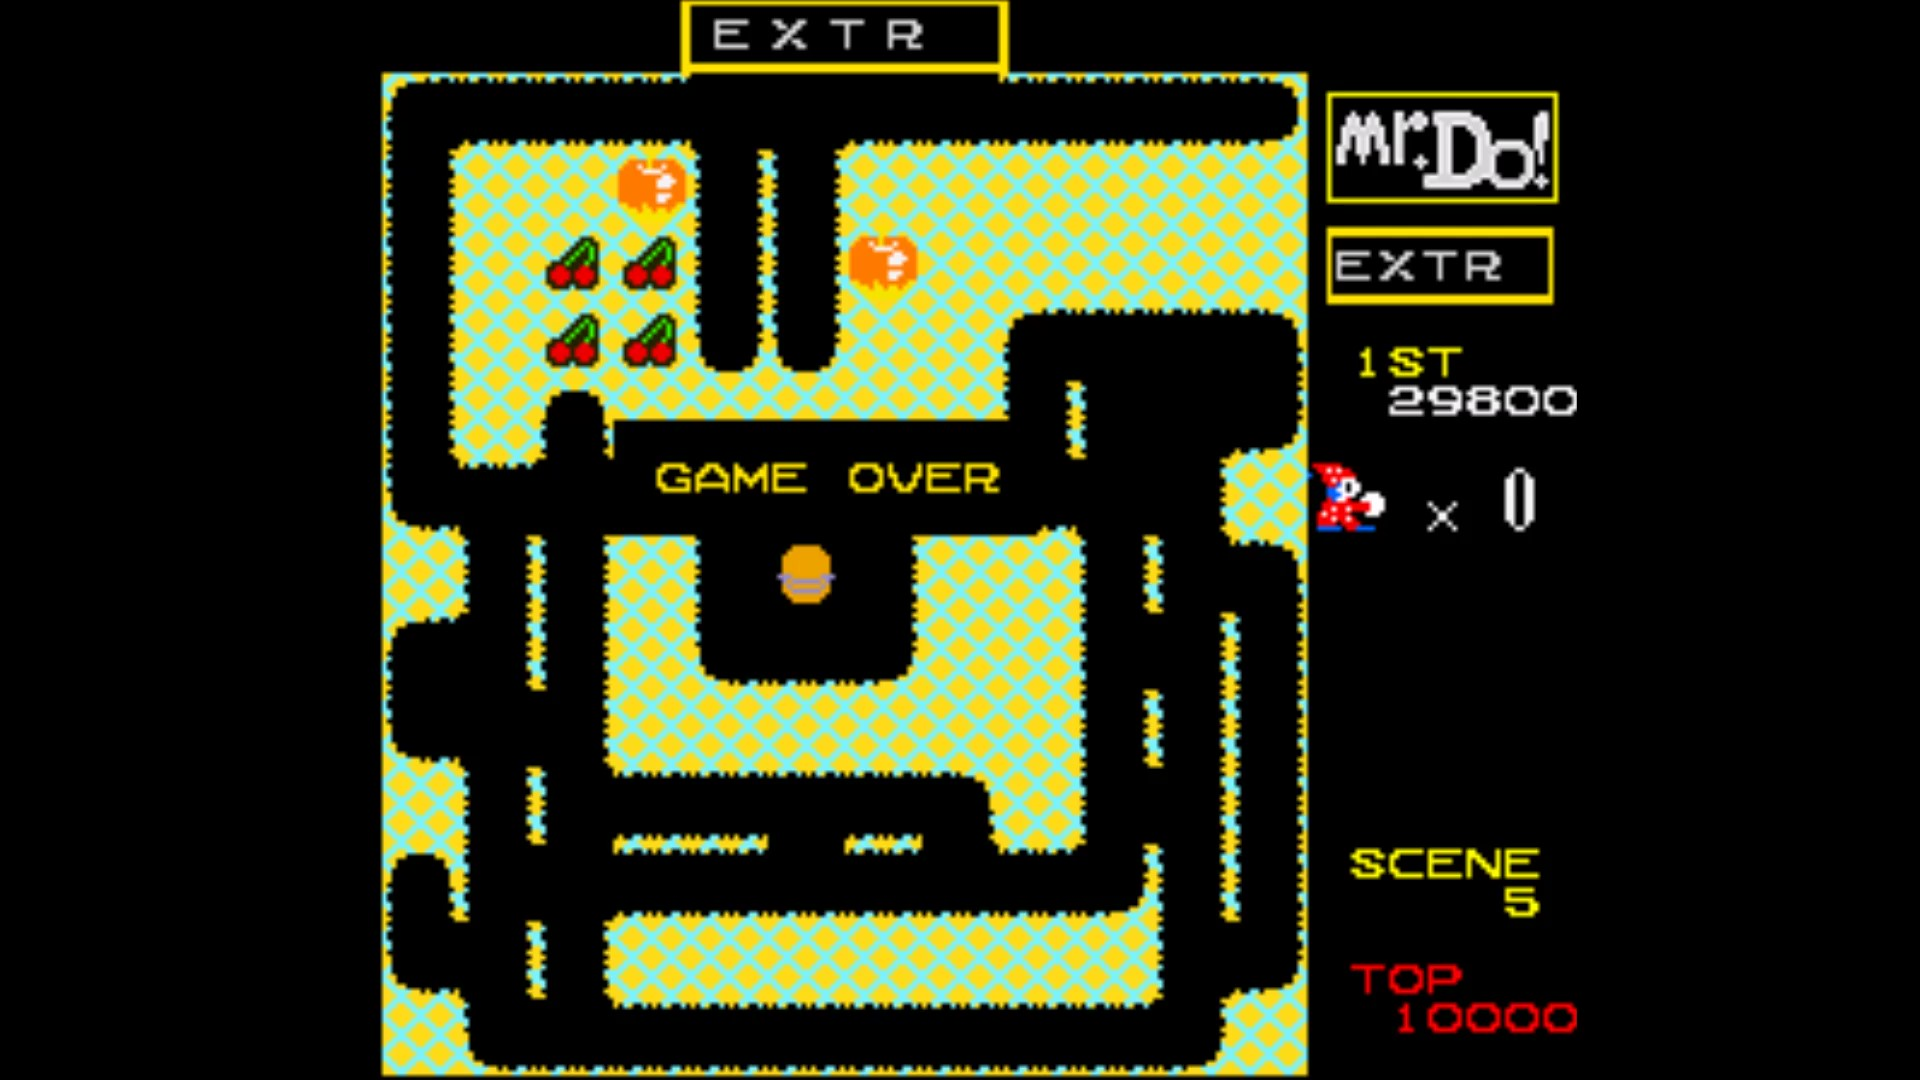 AkinNahtanoj: Mr. Do! (SNES/Super Famicom Emulated) 29,800 points on 2020-08-15 08:53:25